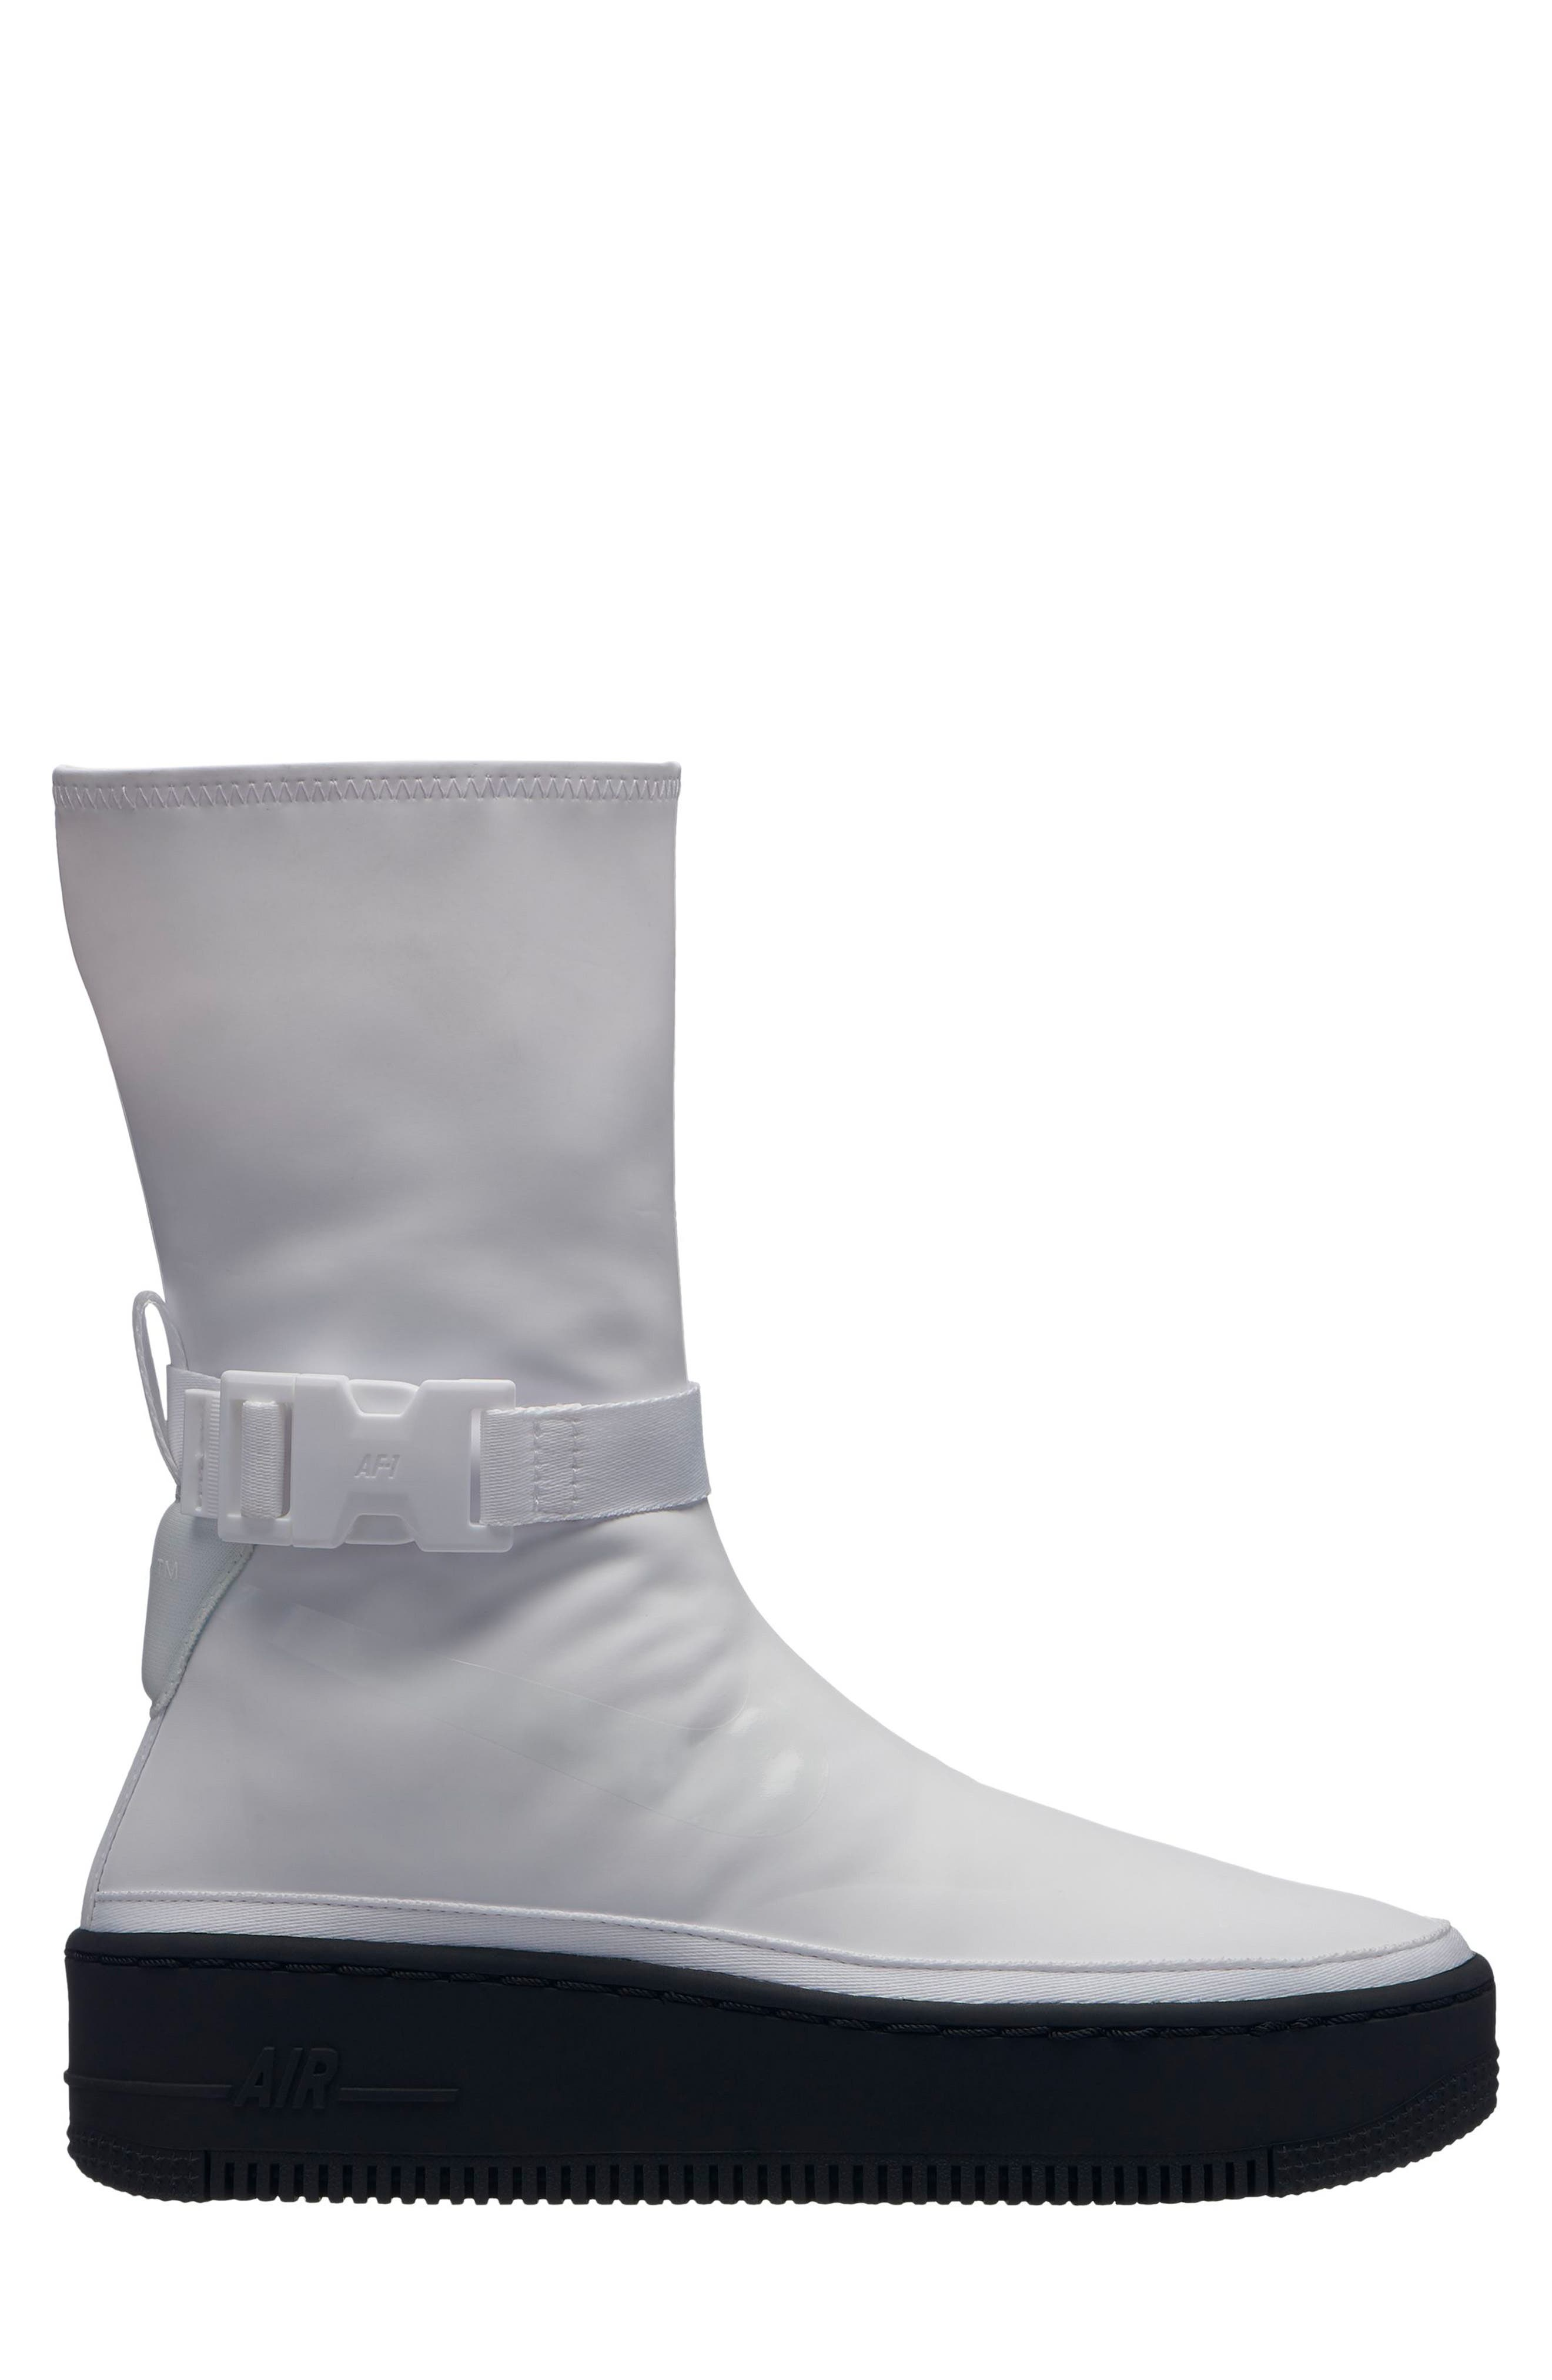 NIKE Air Force 1 Sage High Platform Sneaker, Main, color, WHITE/ WHITE/ BLACK